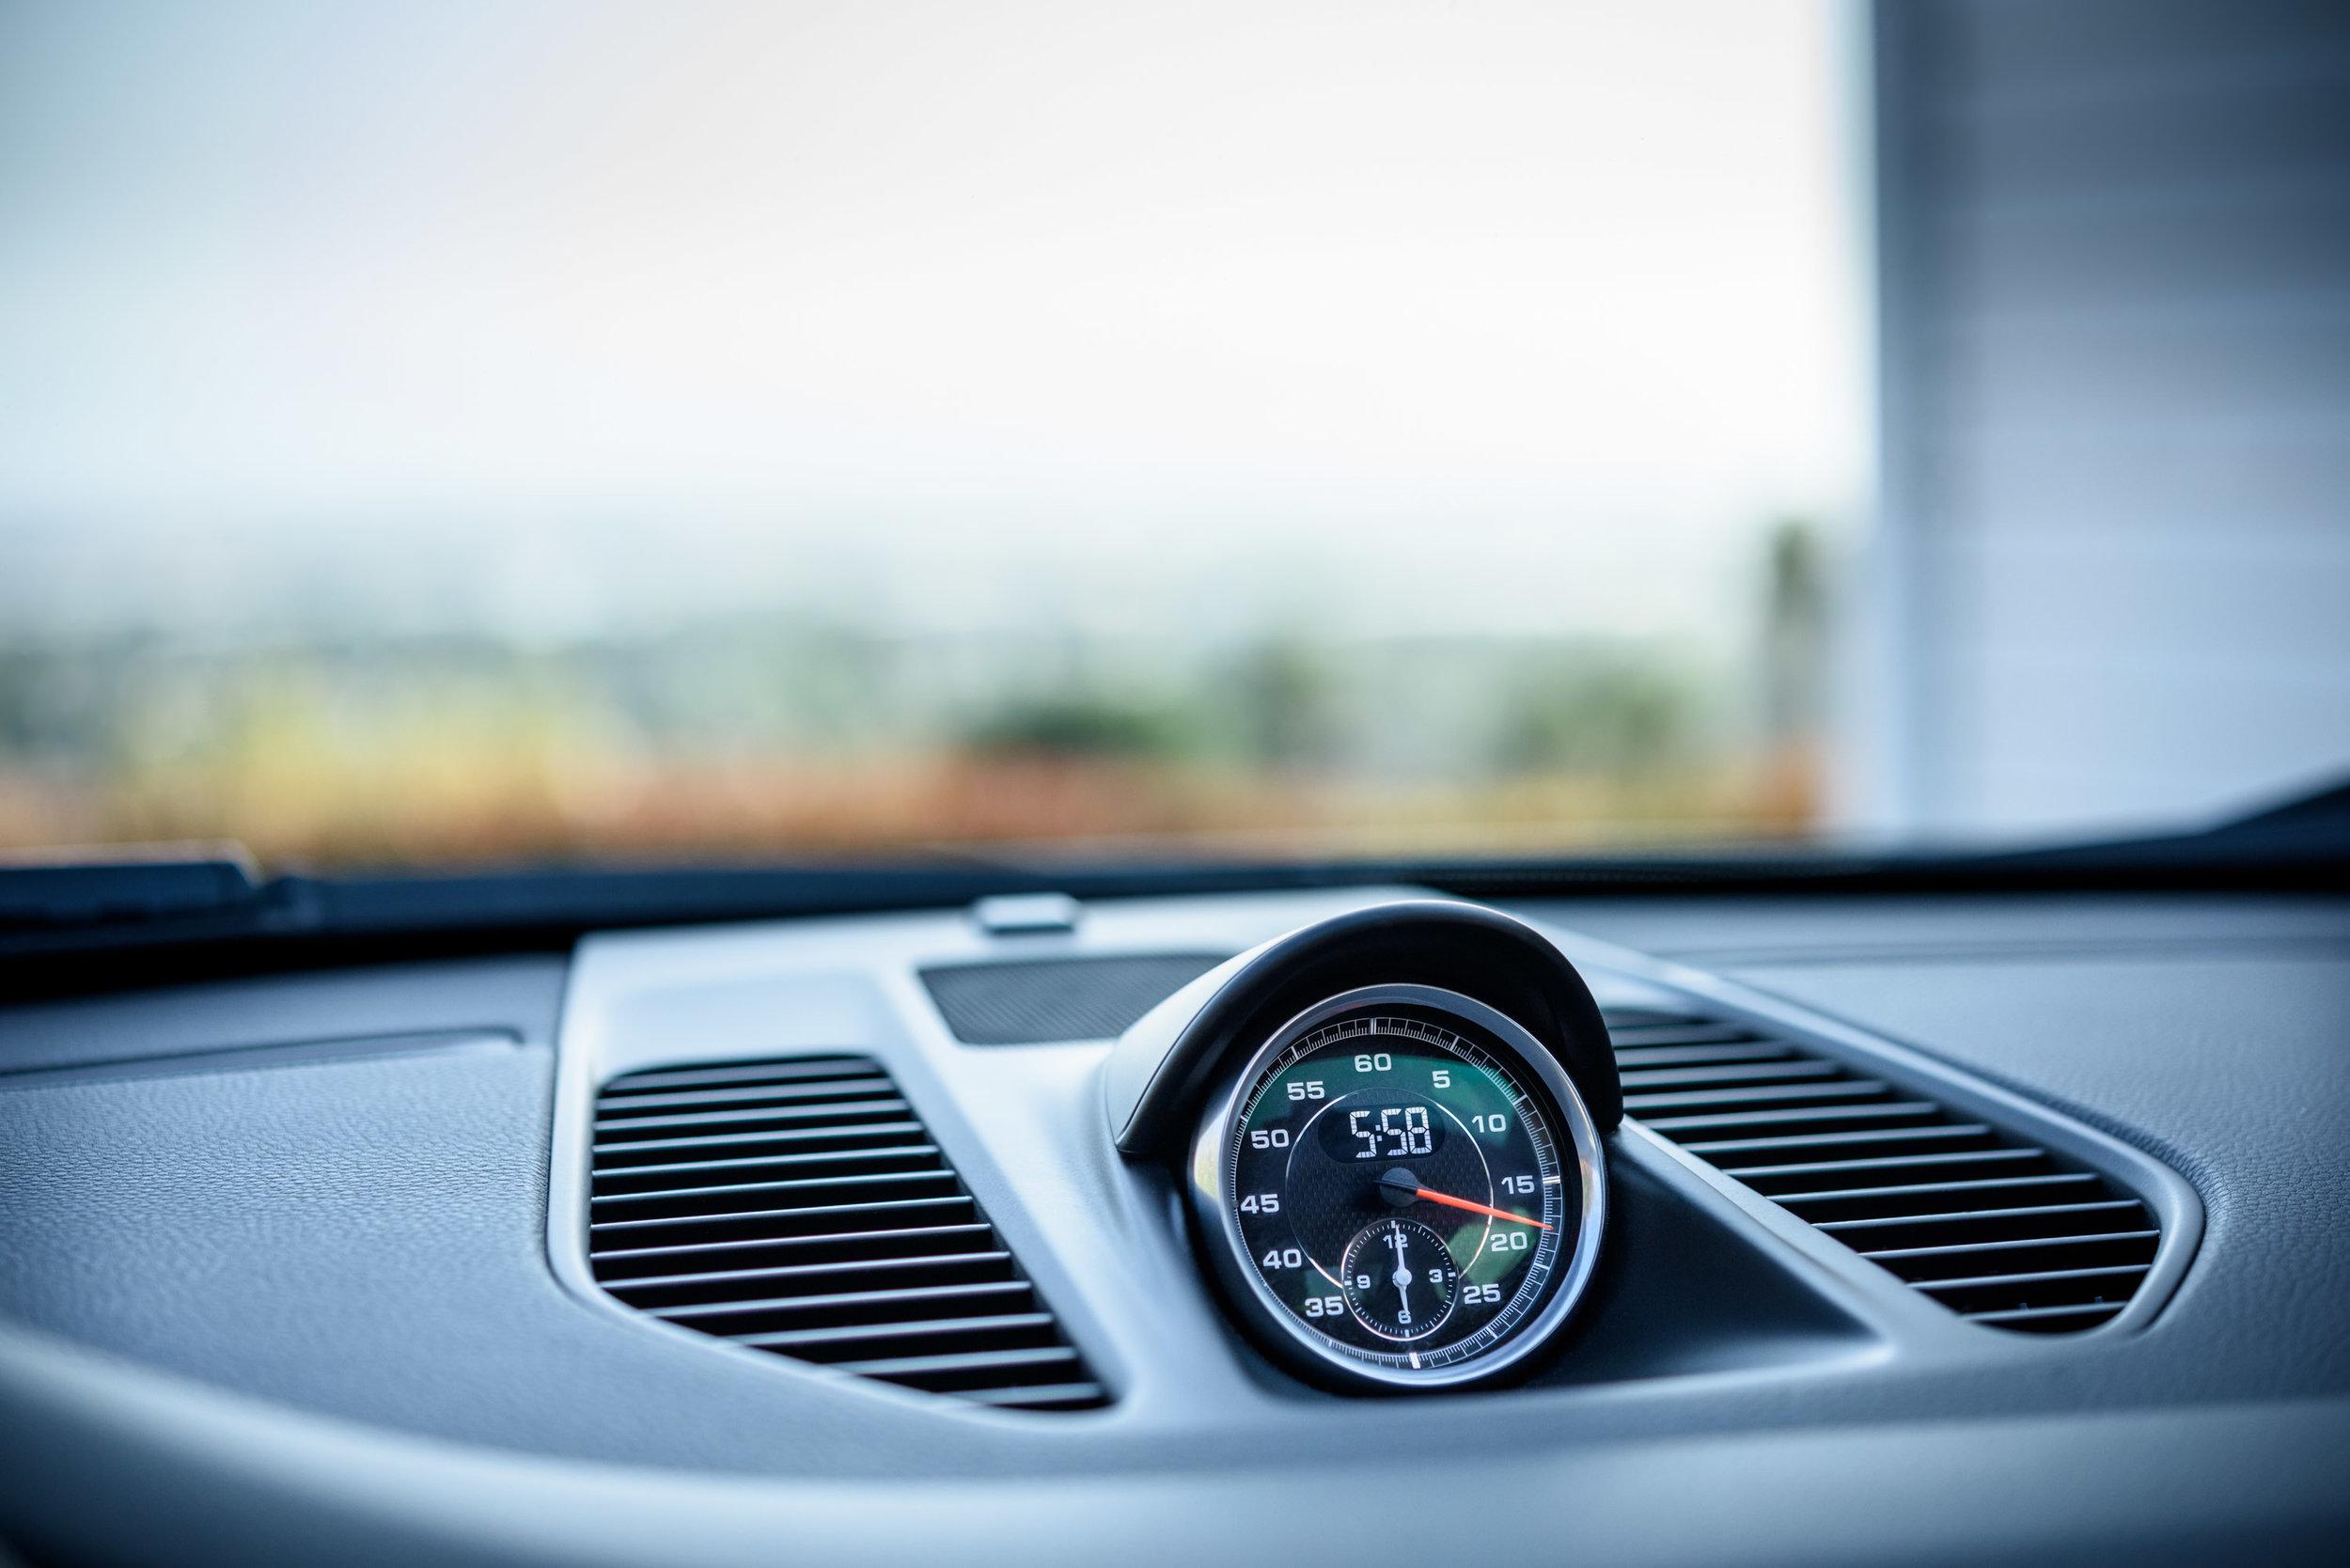 porsche 911 carrera s 2012 sport chrono gauge by Jordan Reeder